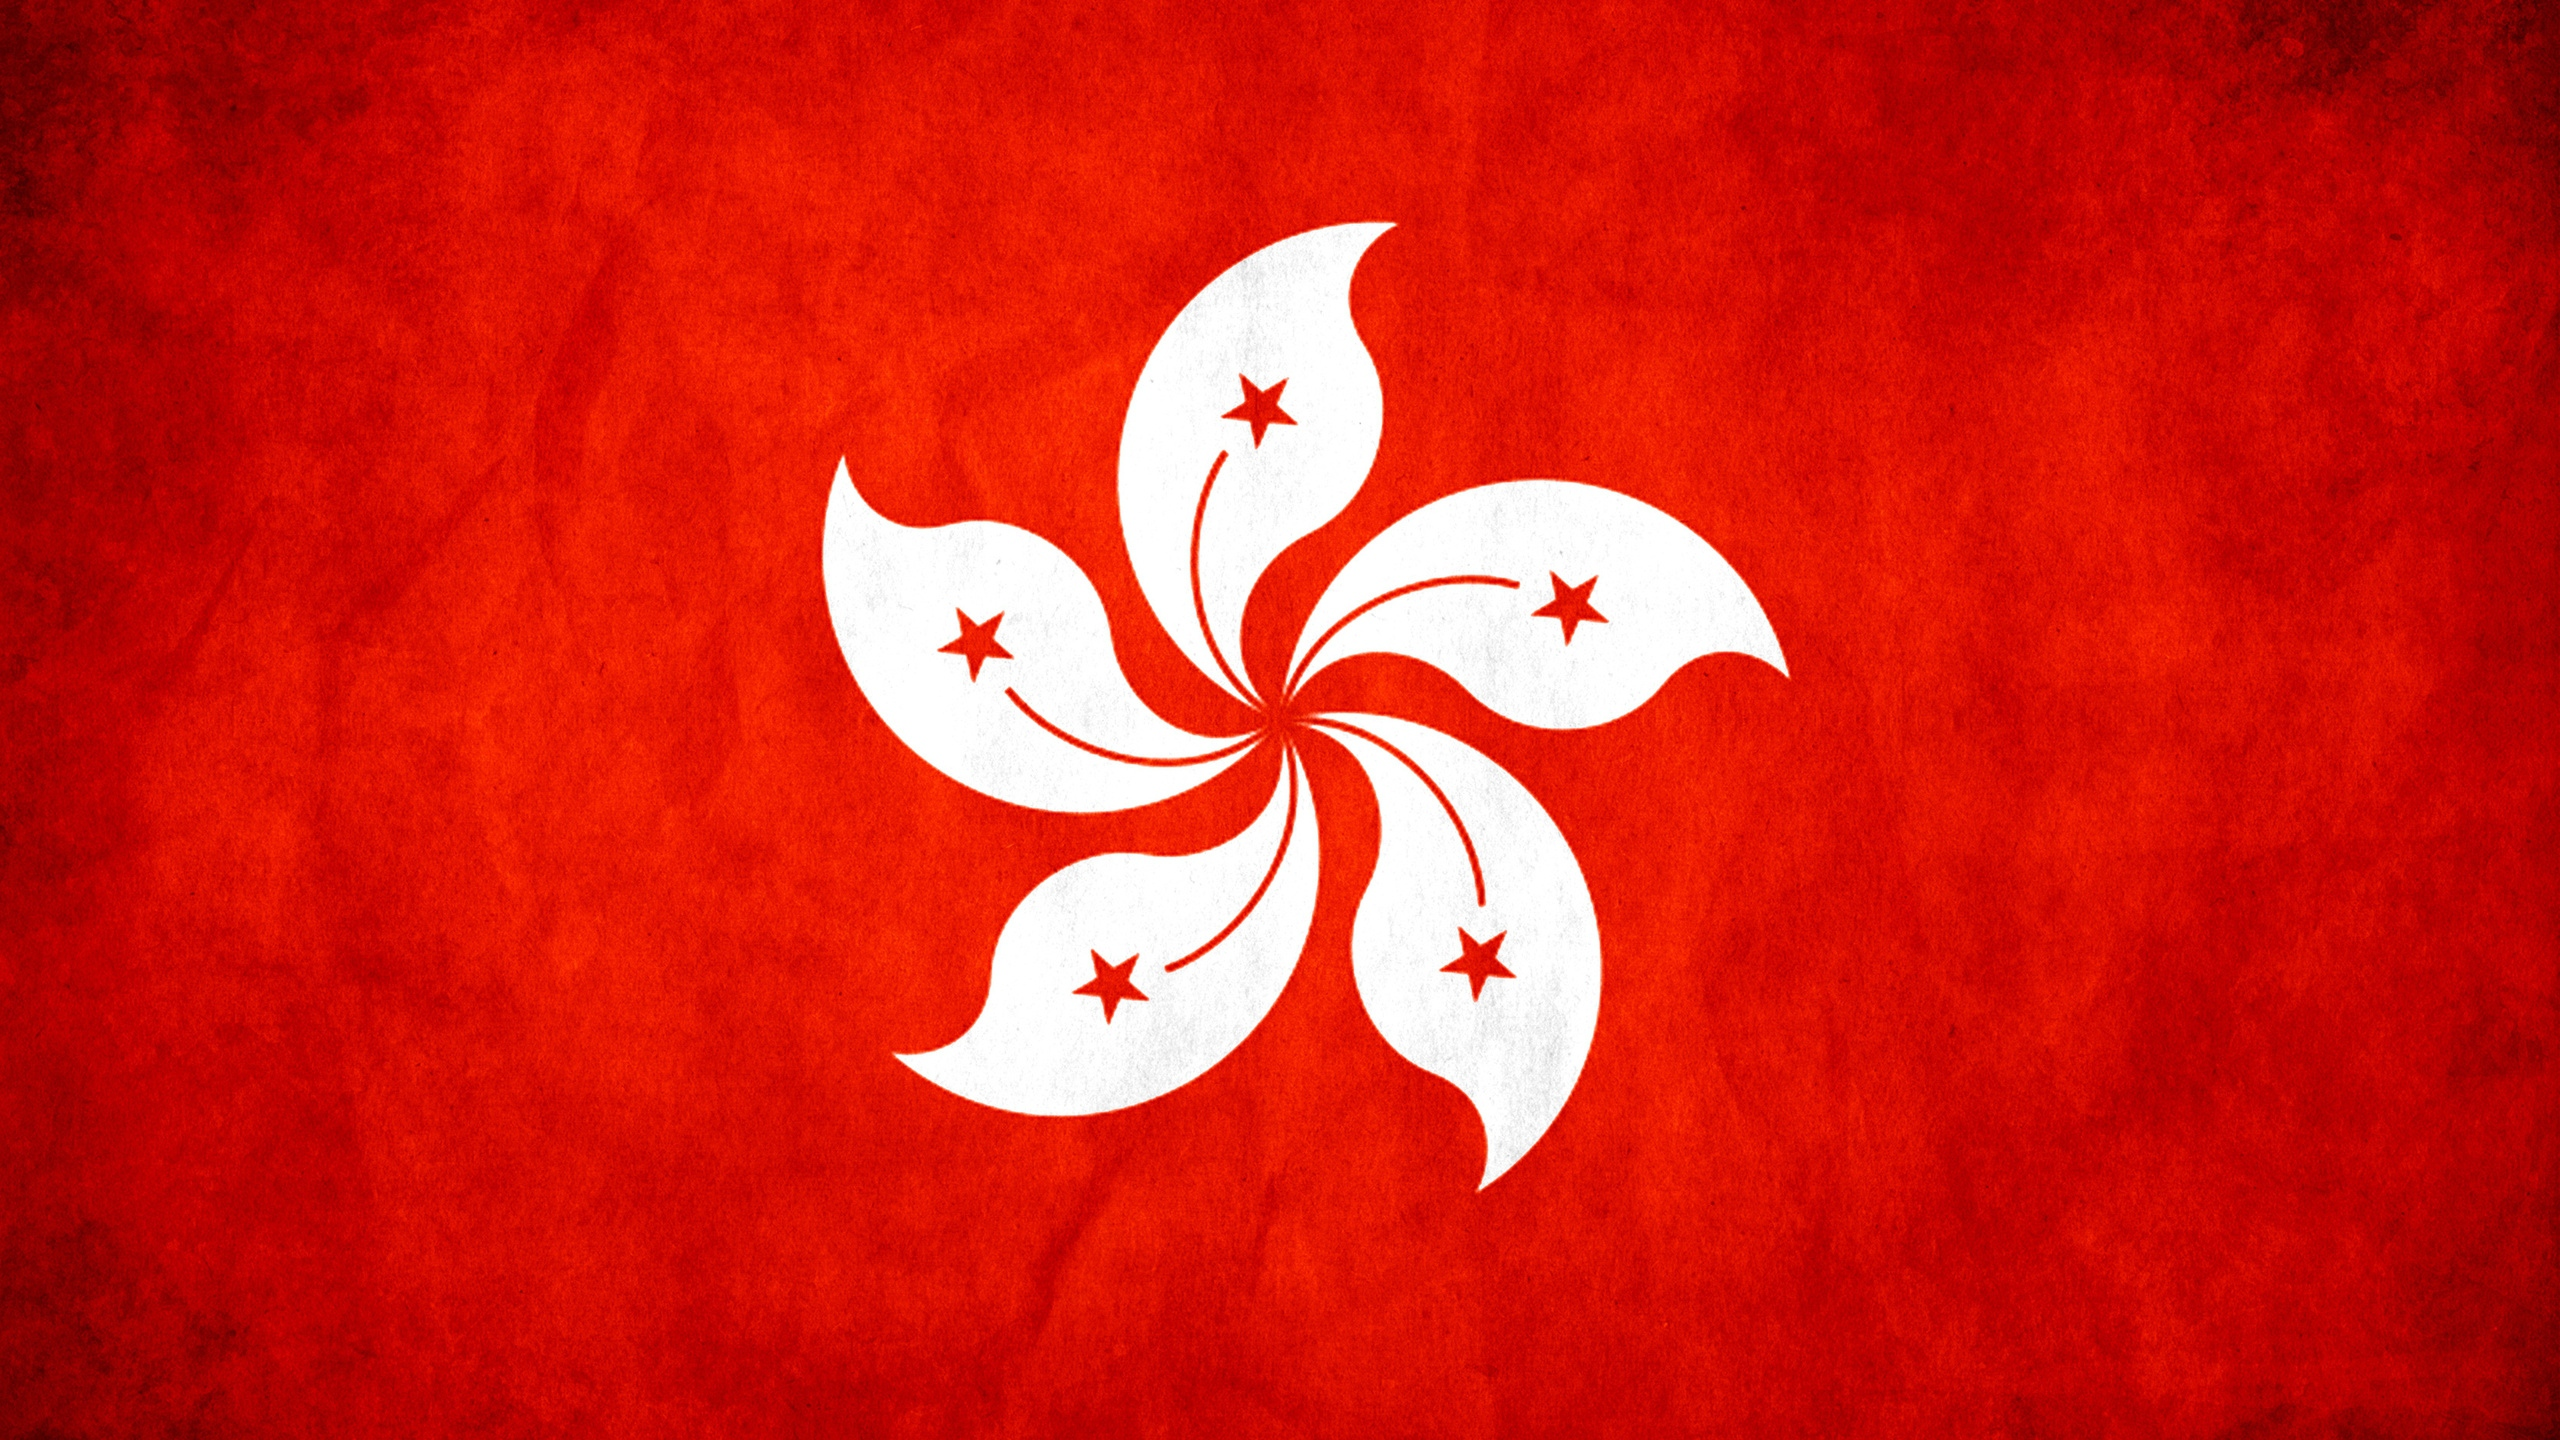 Hong Kong Flag Wallpaper Background HD 52194 2560x1440px 2560x1440